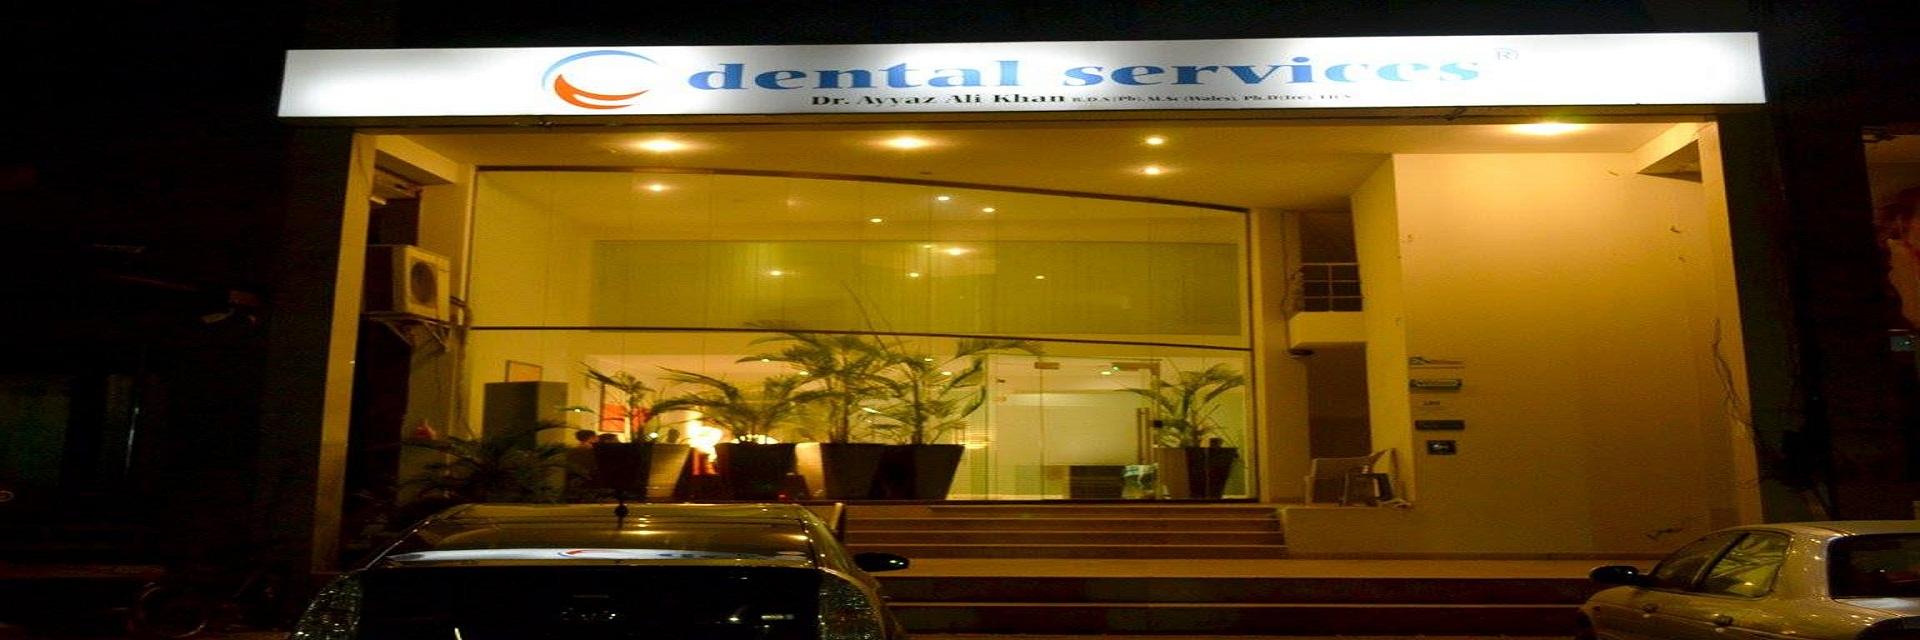 Dental services front